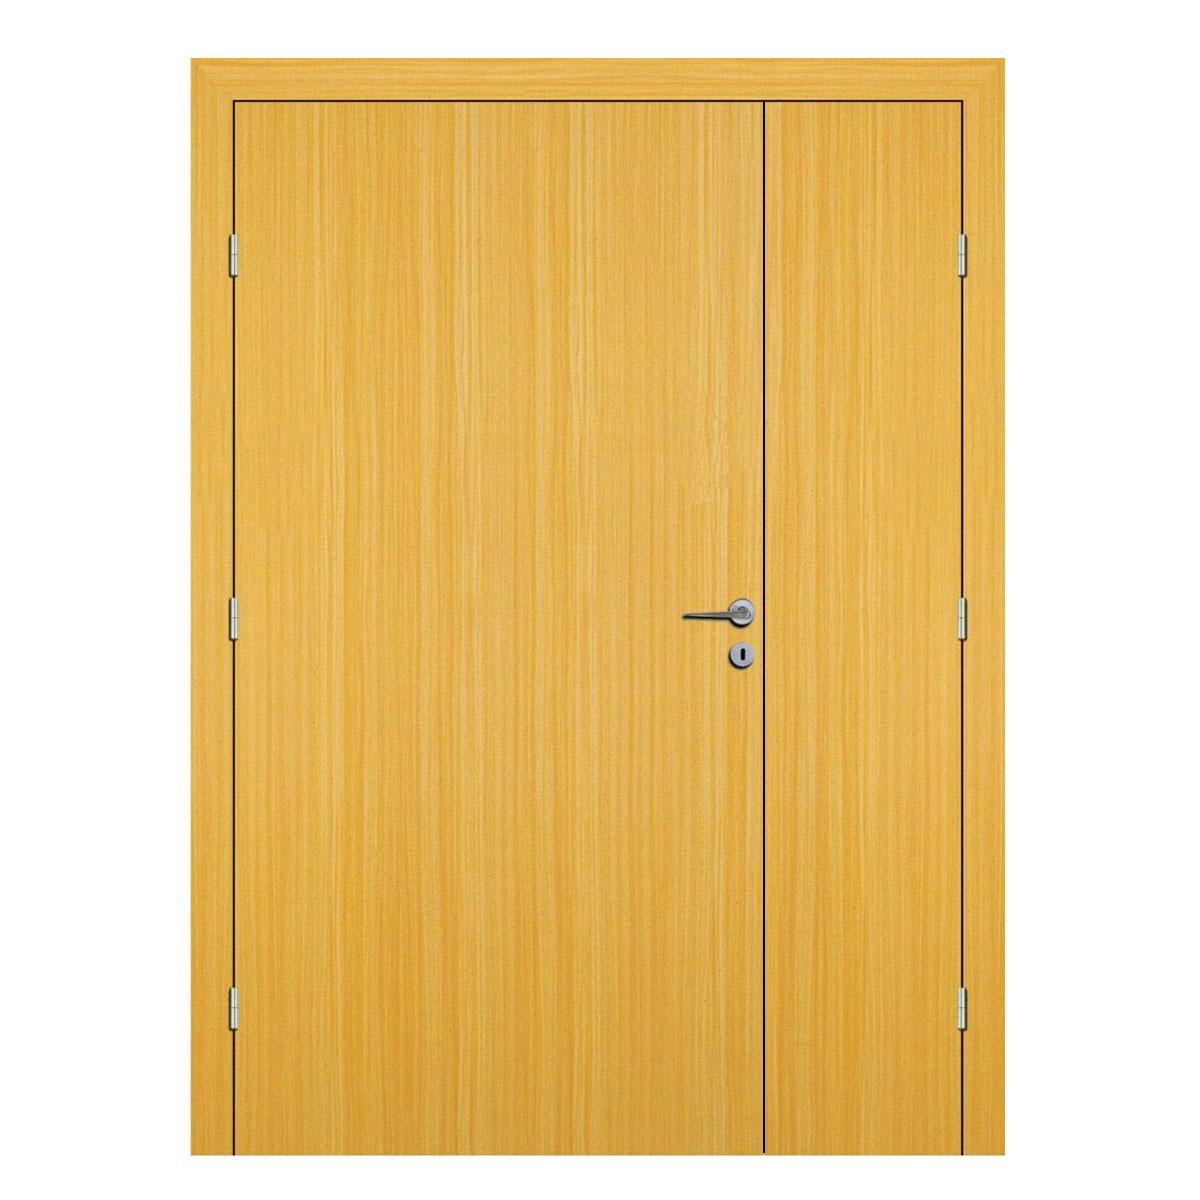 Koto Hospital Doors